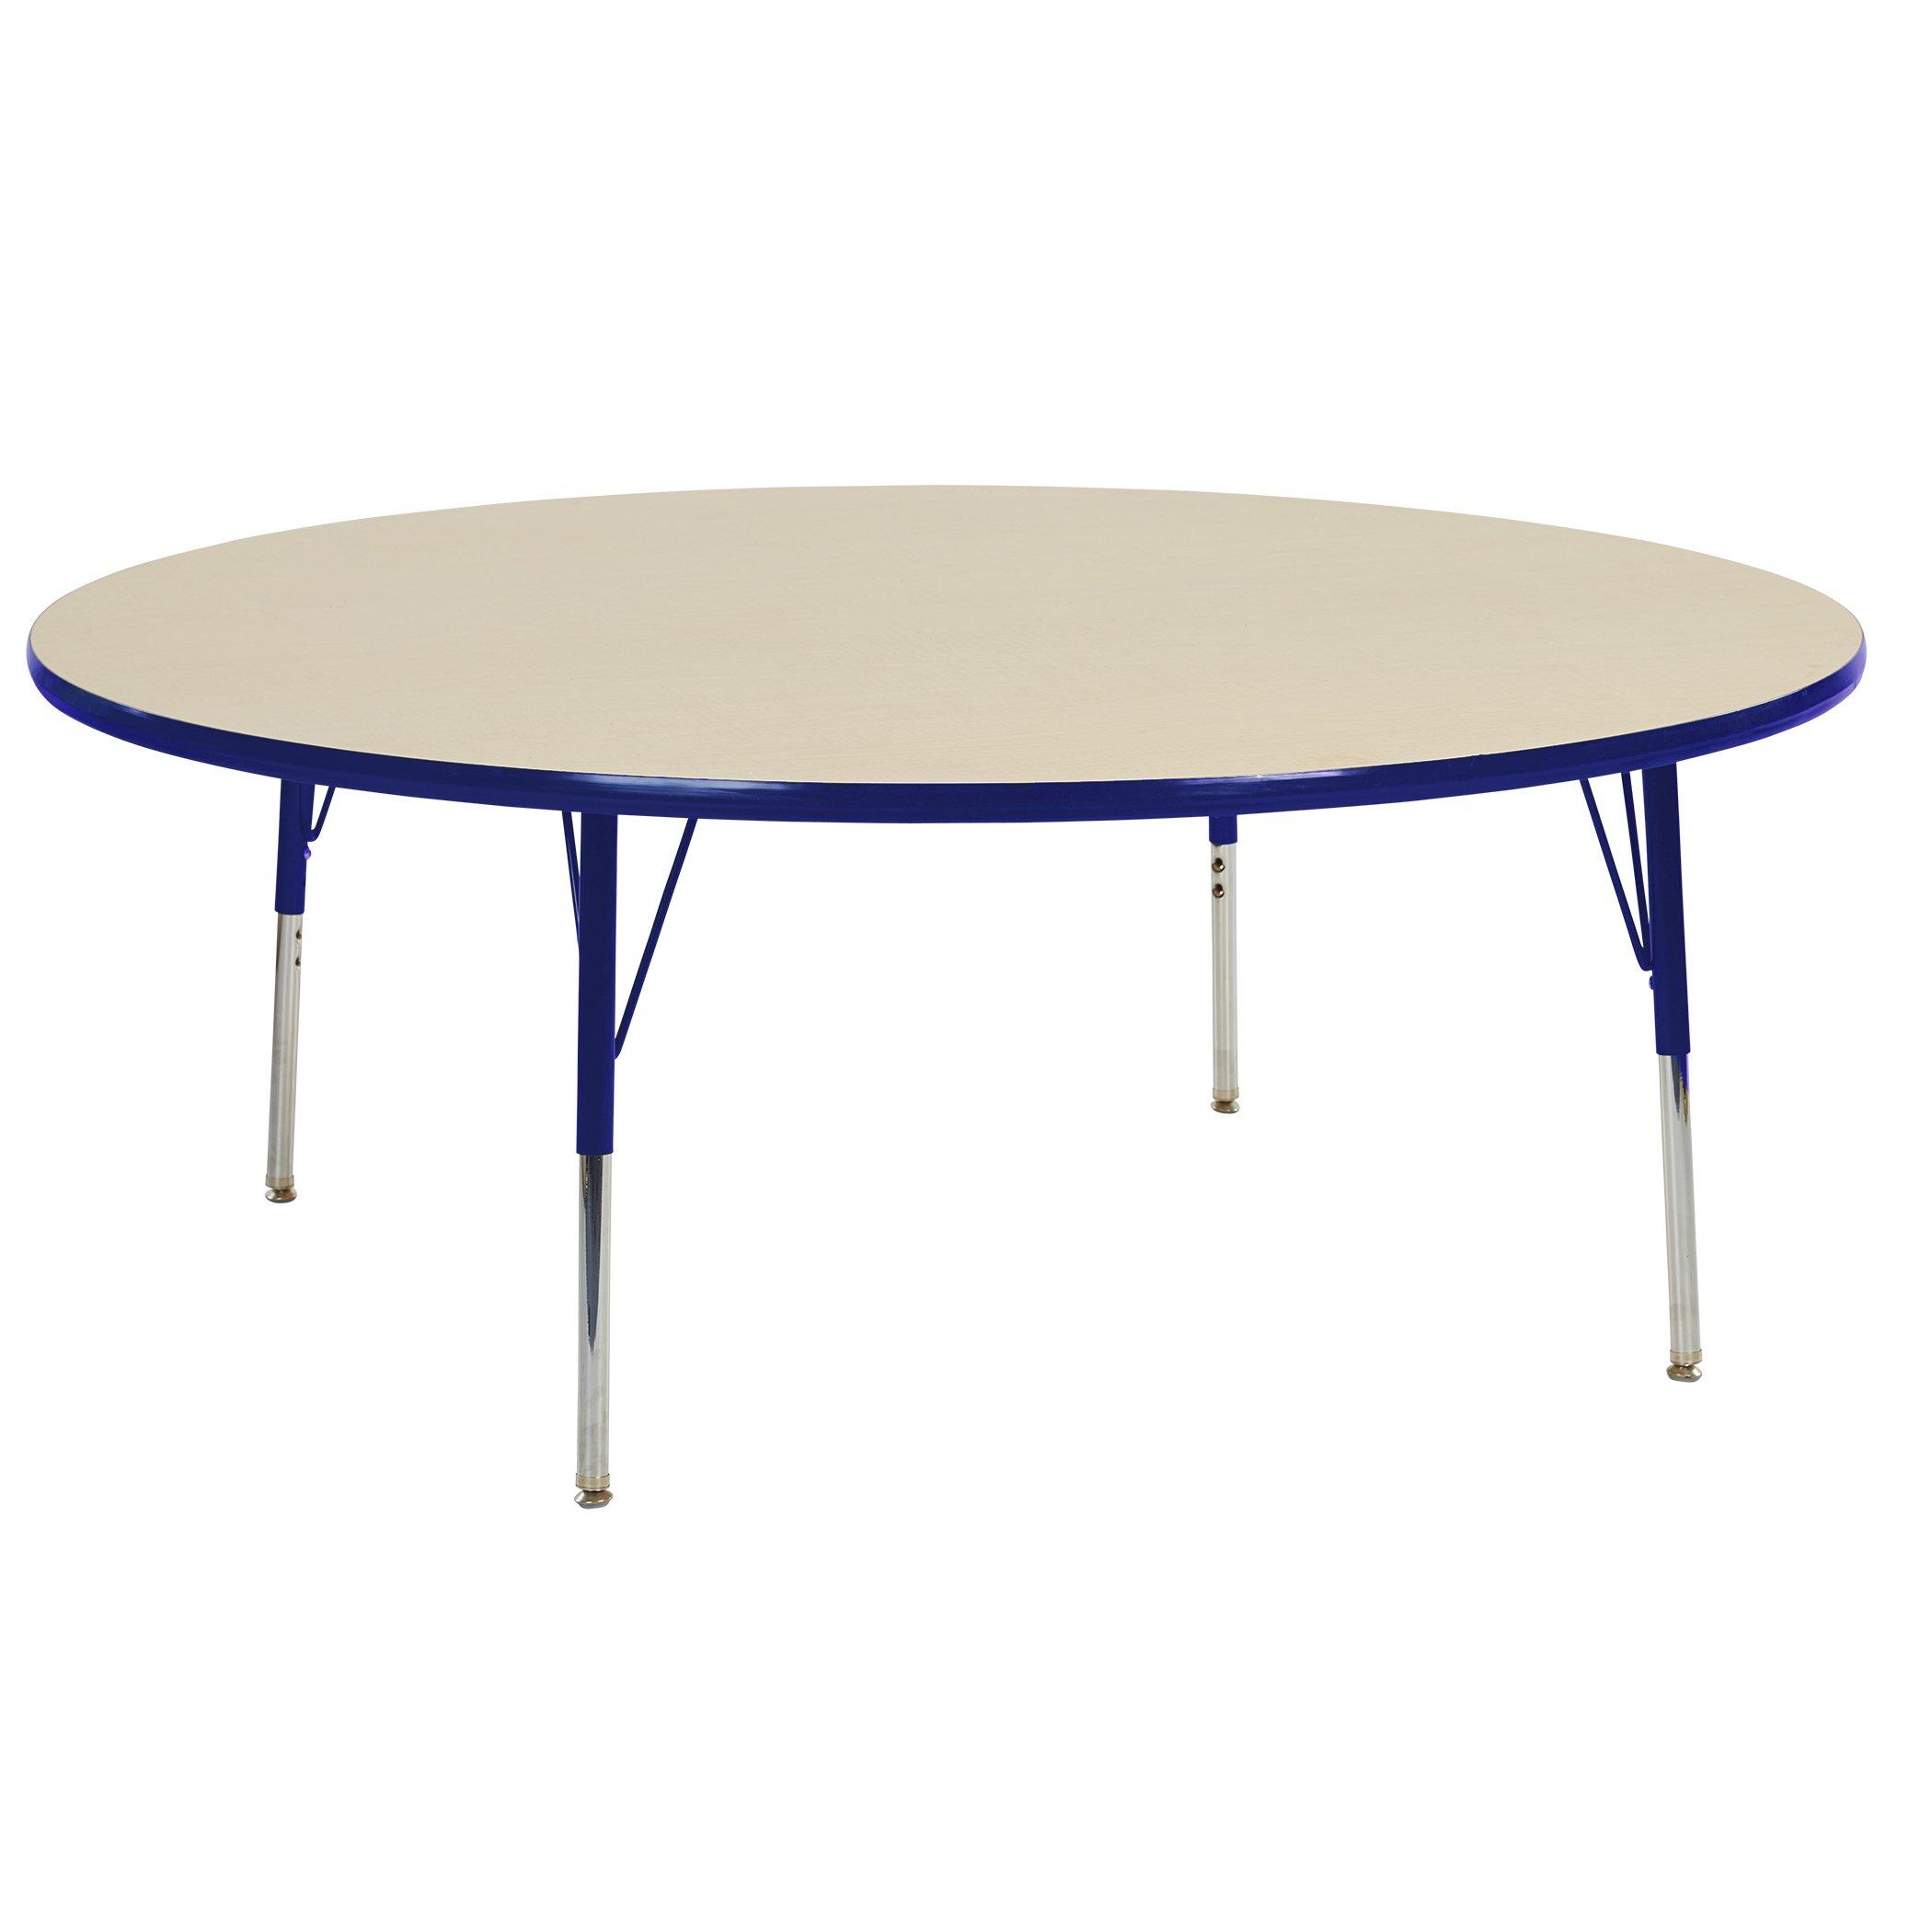 ECR4Kids T-Mold 60'' Round Activity School Table, Standard Legs w/ Swivel Glides, Adjustable Height 19-30 inch (Maple/Blue)